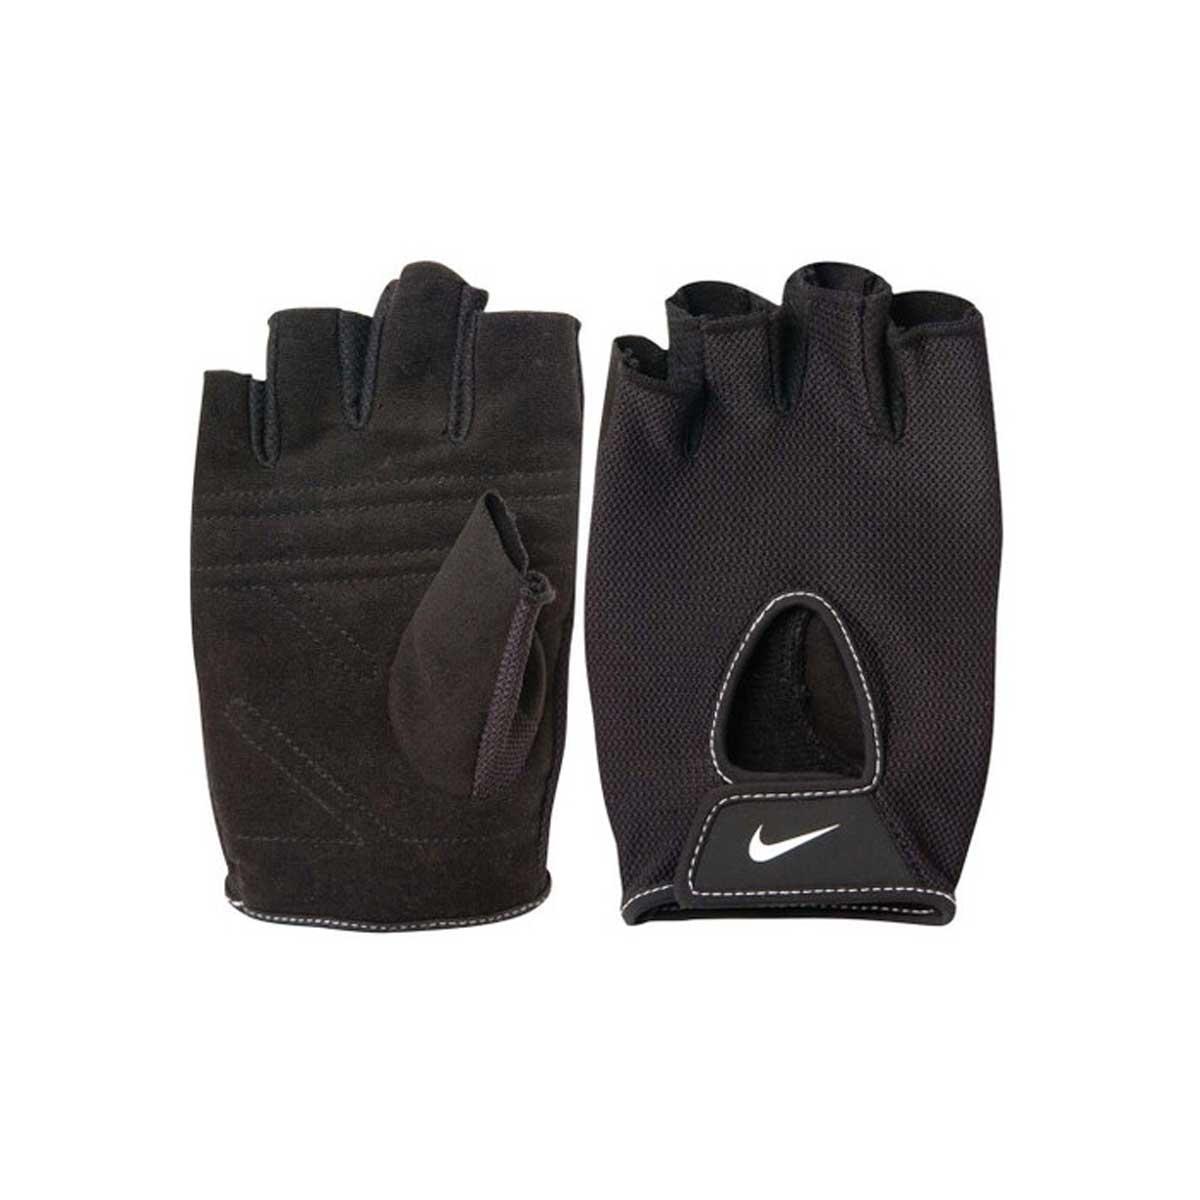 Nike Fundamental Training Gloves: Buy Nike Womens Fundamental Training Gloves Online India